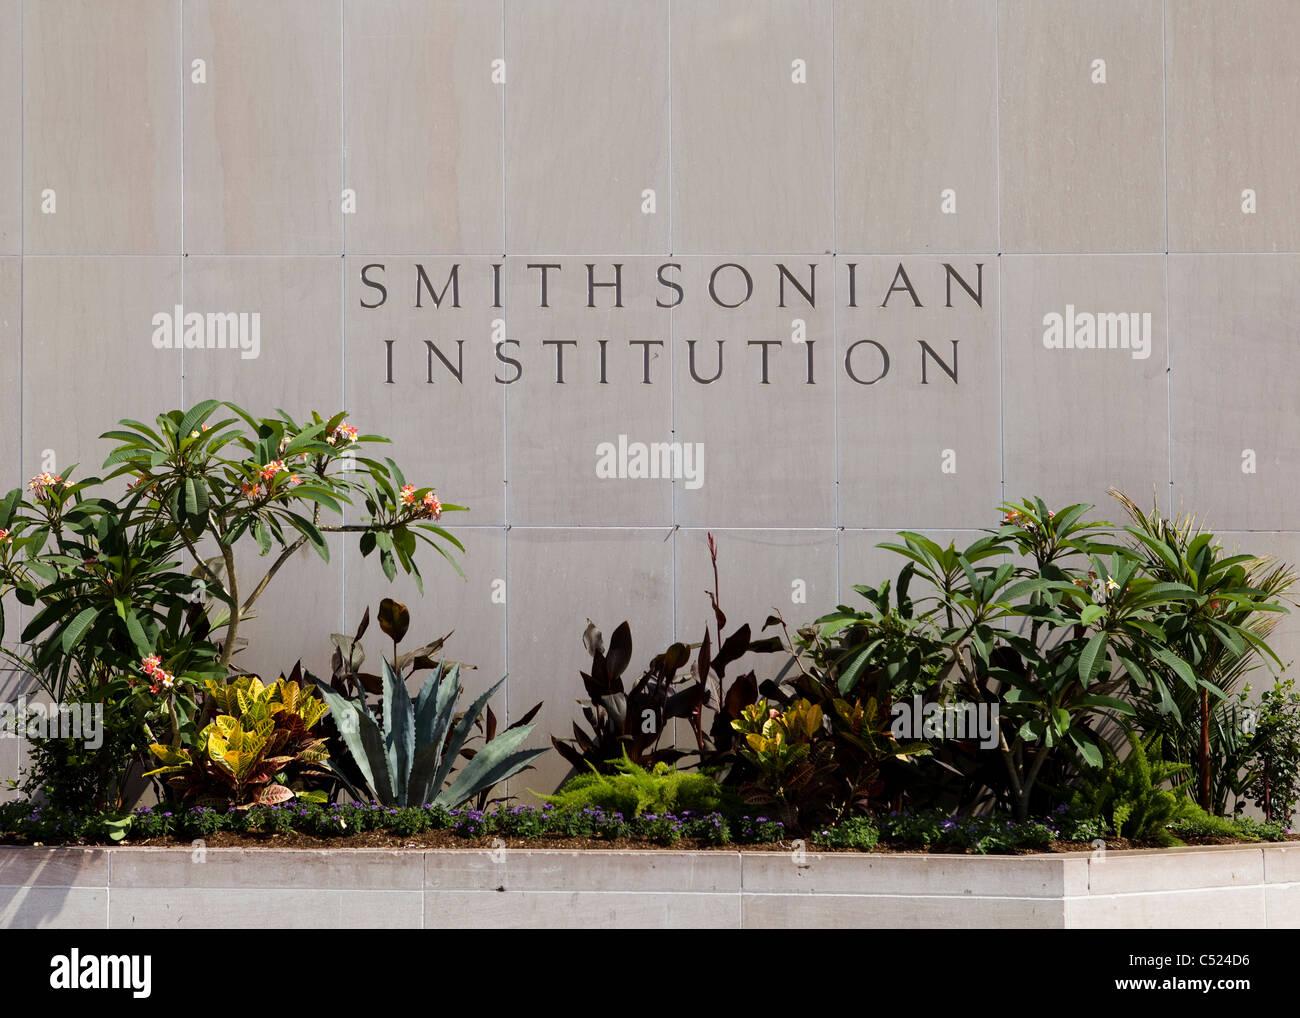 Smithsonian Institution - Washington, DC USA - Stock Image